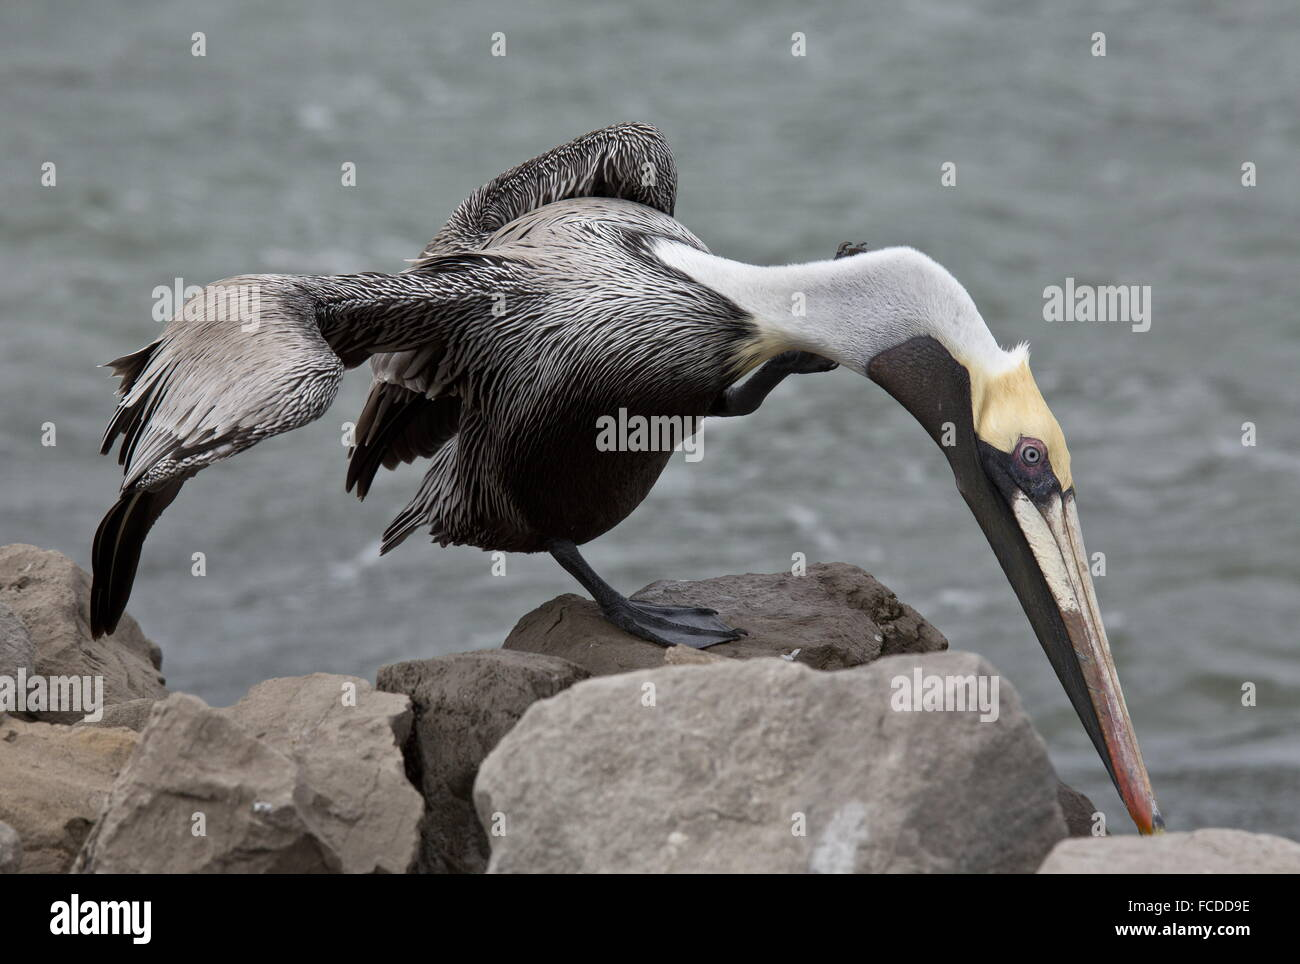 Brown Pelican, Pelecanus occidentalis, preening; in winter; Gulf coast, Texas. Stock Photo